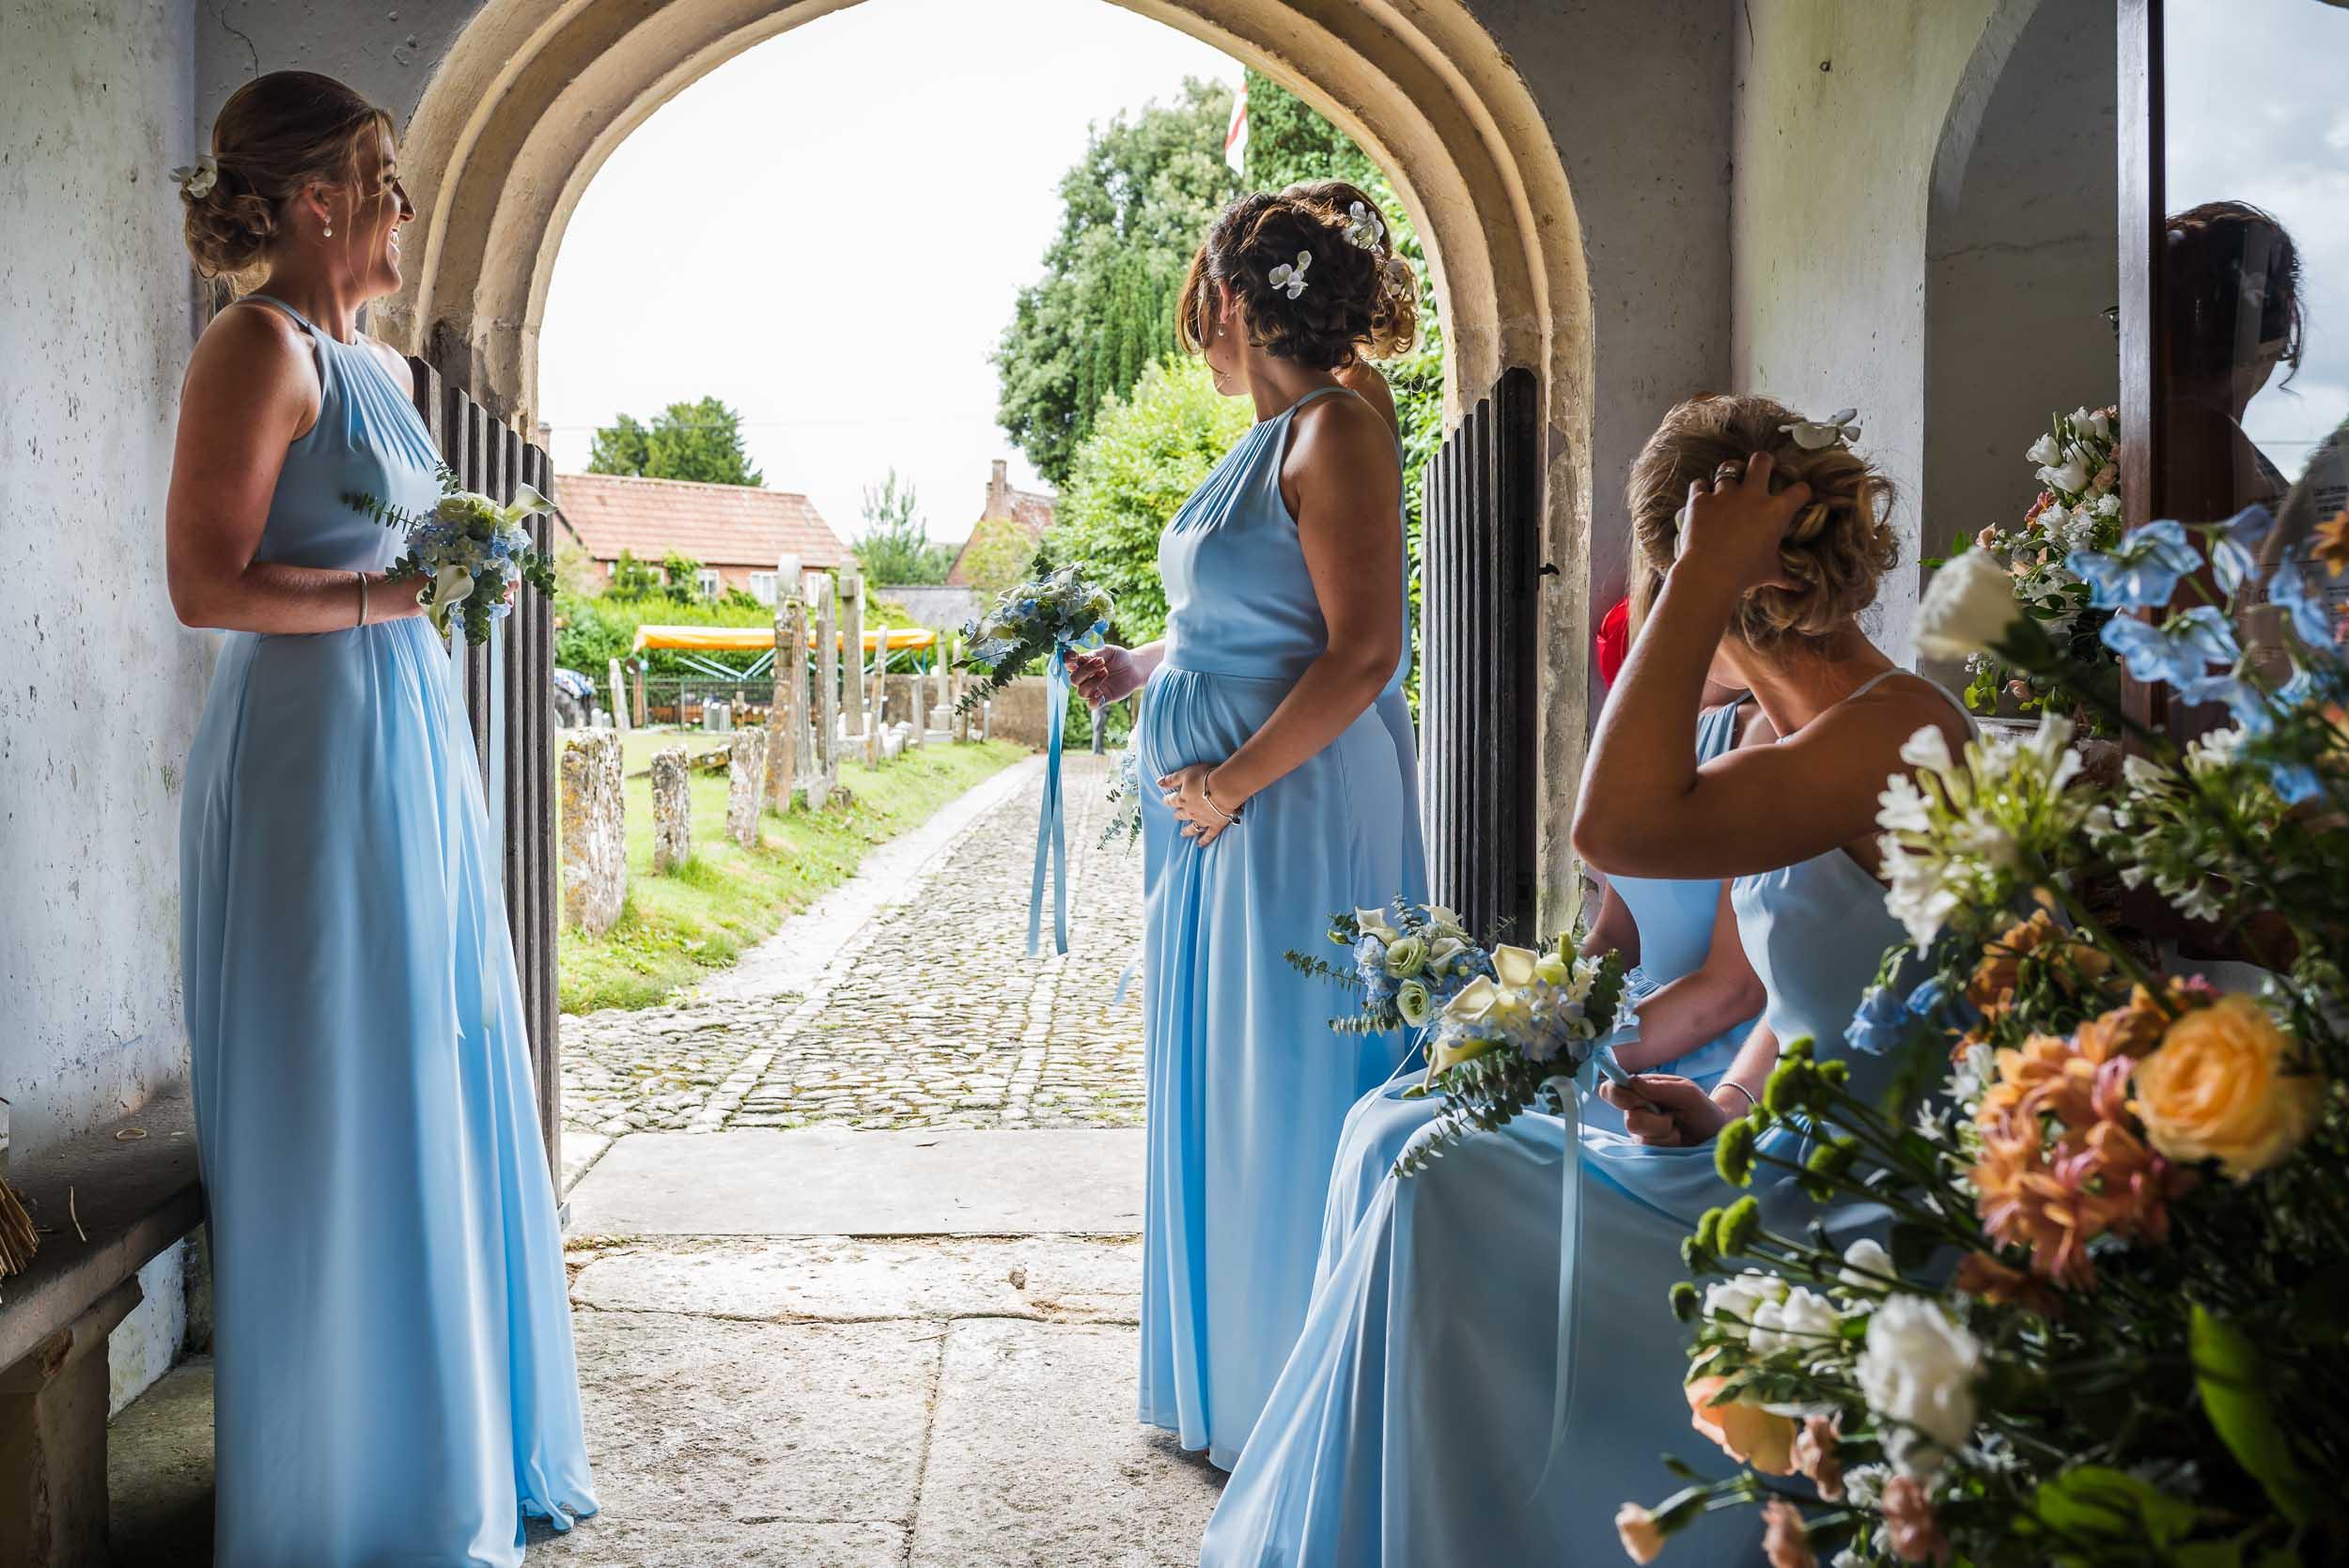 NC-20170722-sophie-and-jonny-wedding-1291.jpg